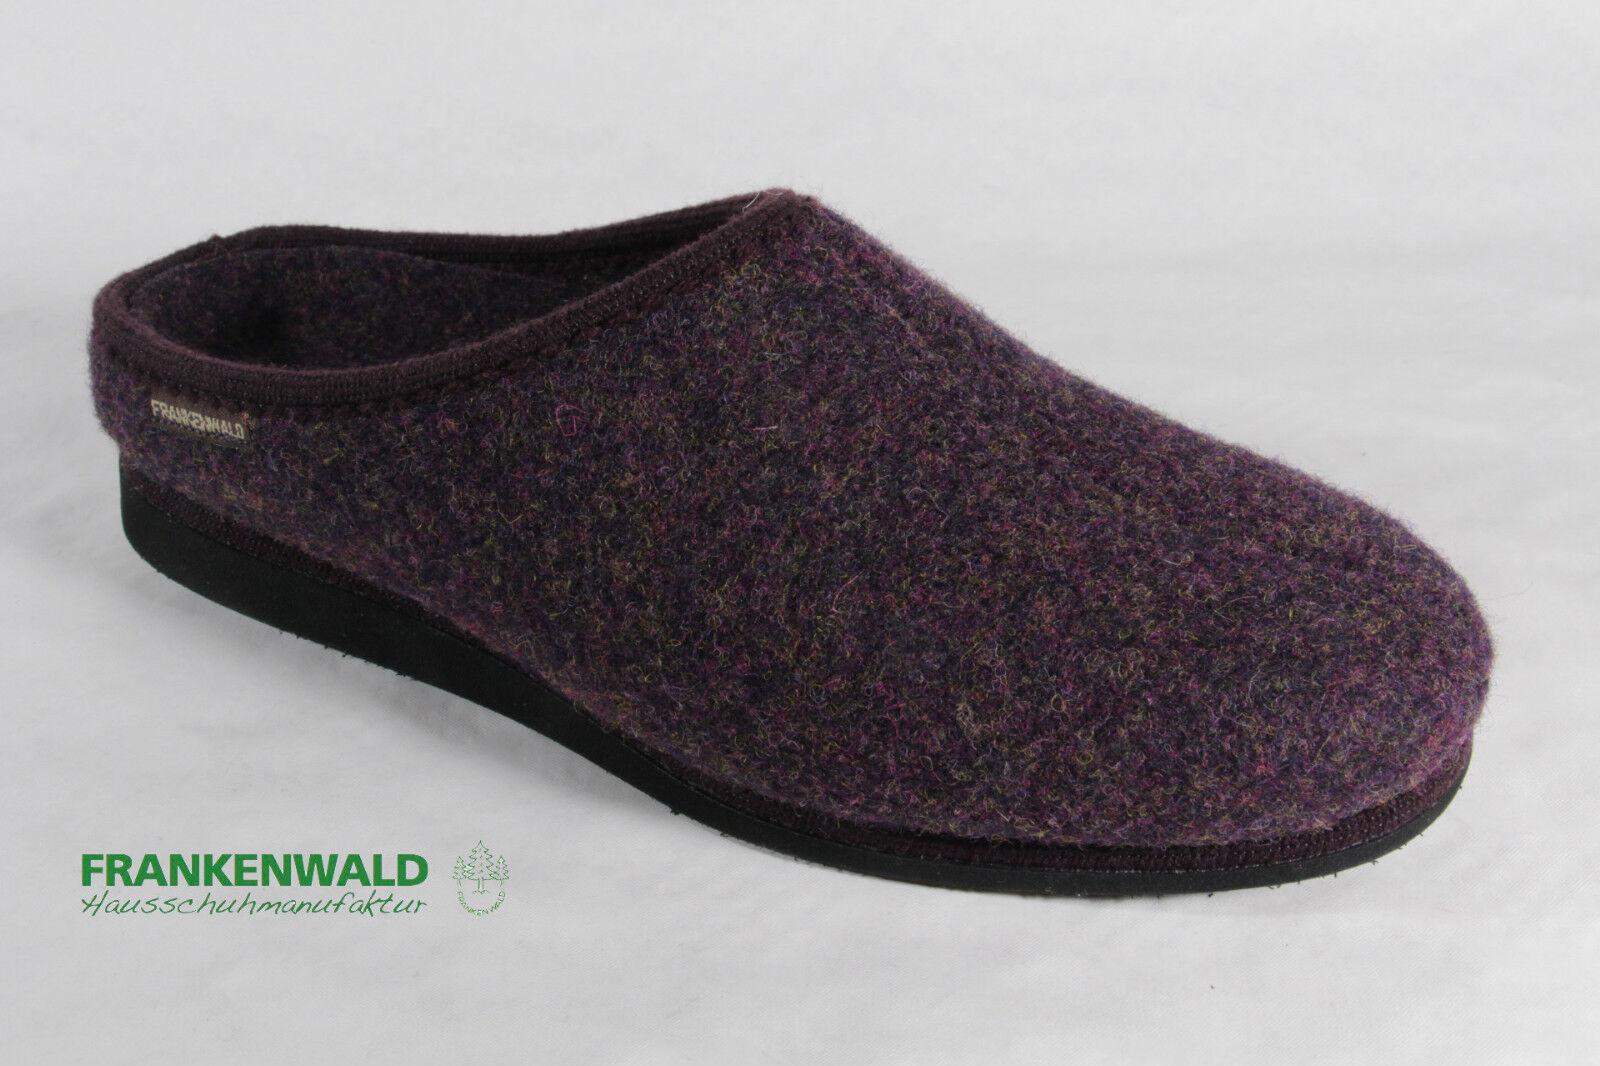 Frankenwald le Signore Pantofola,Pantofole Ciabatte con Fodera in Feltro,Lilla